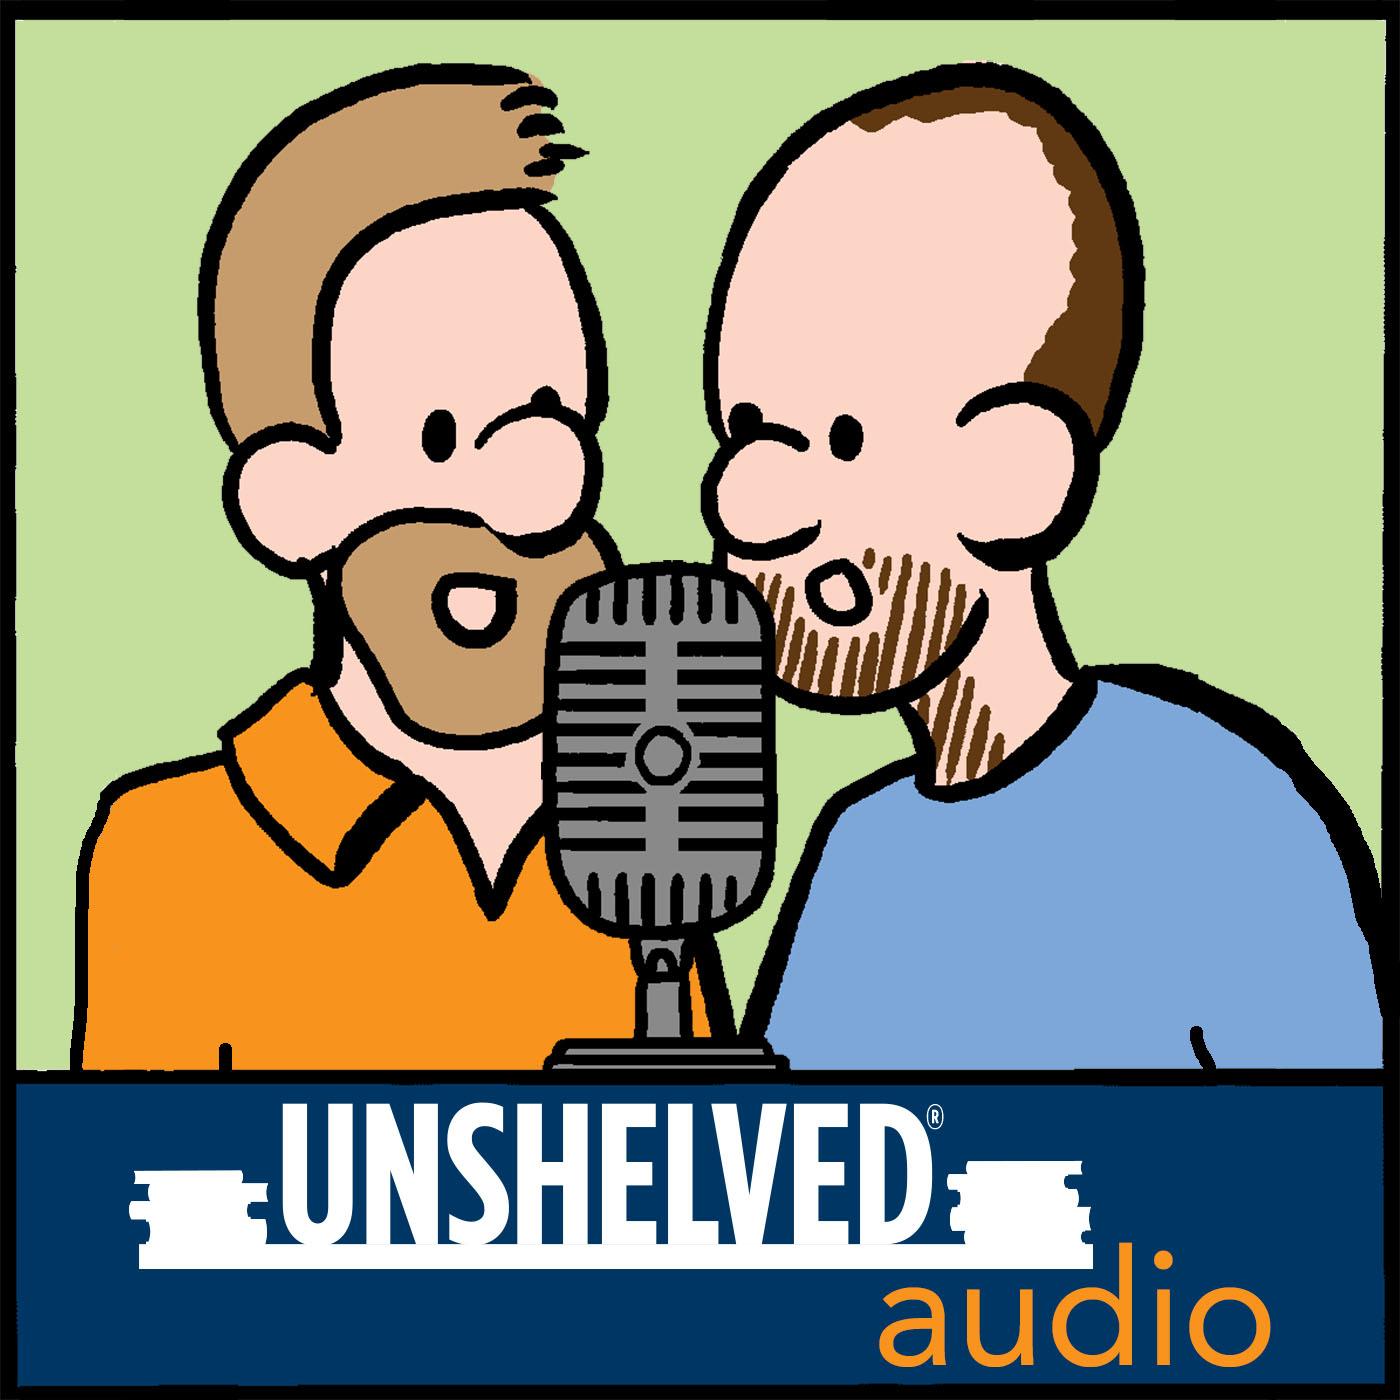 The Unshelved Podcast